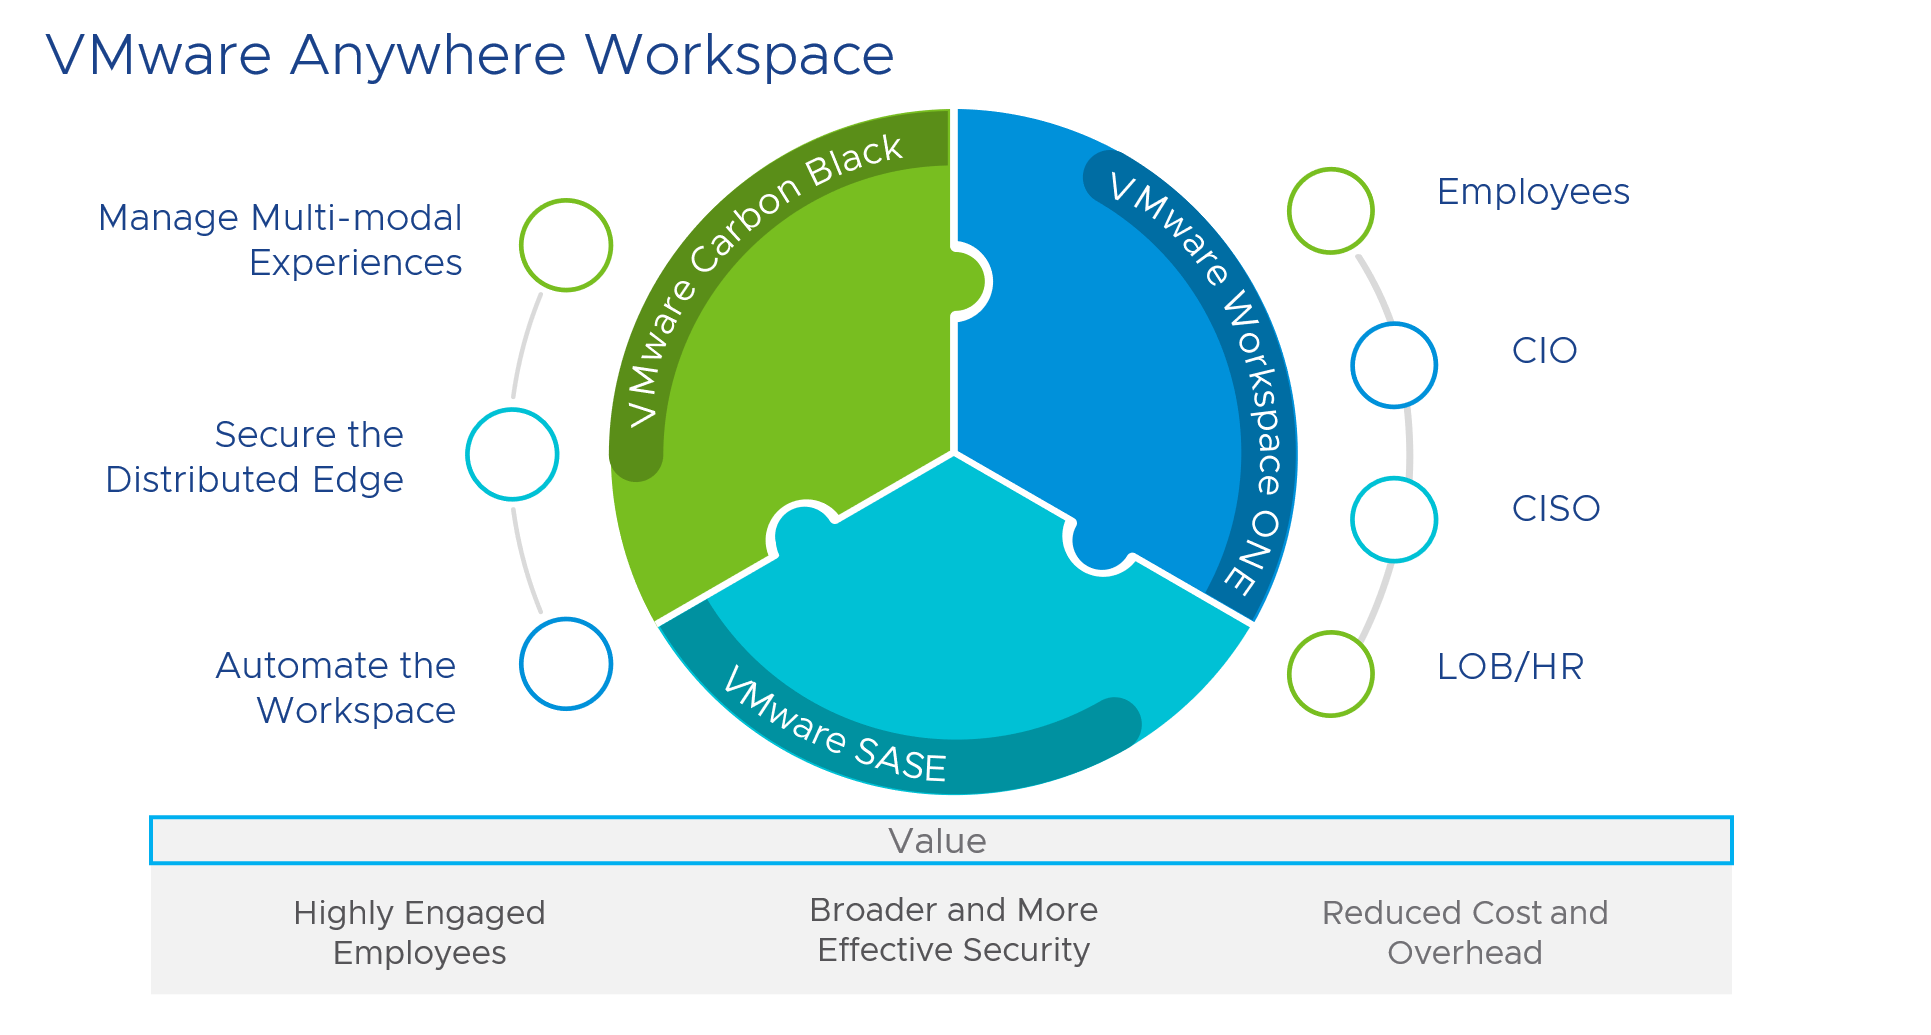 vmware anywhere workspace